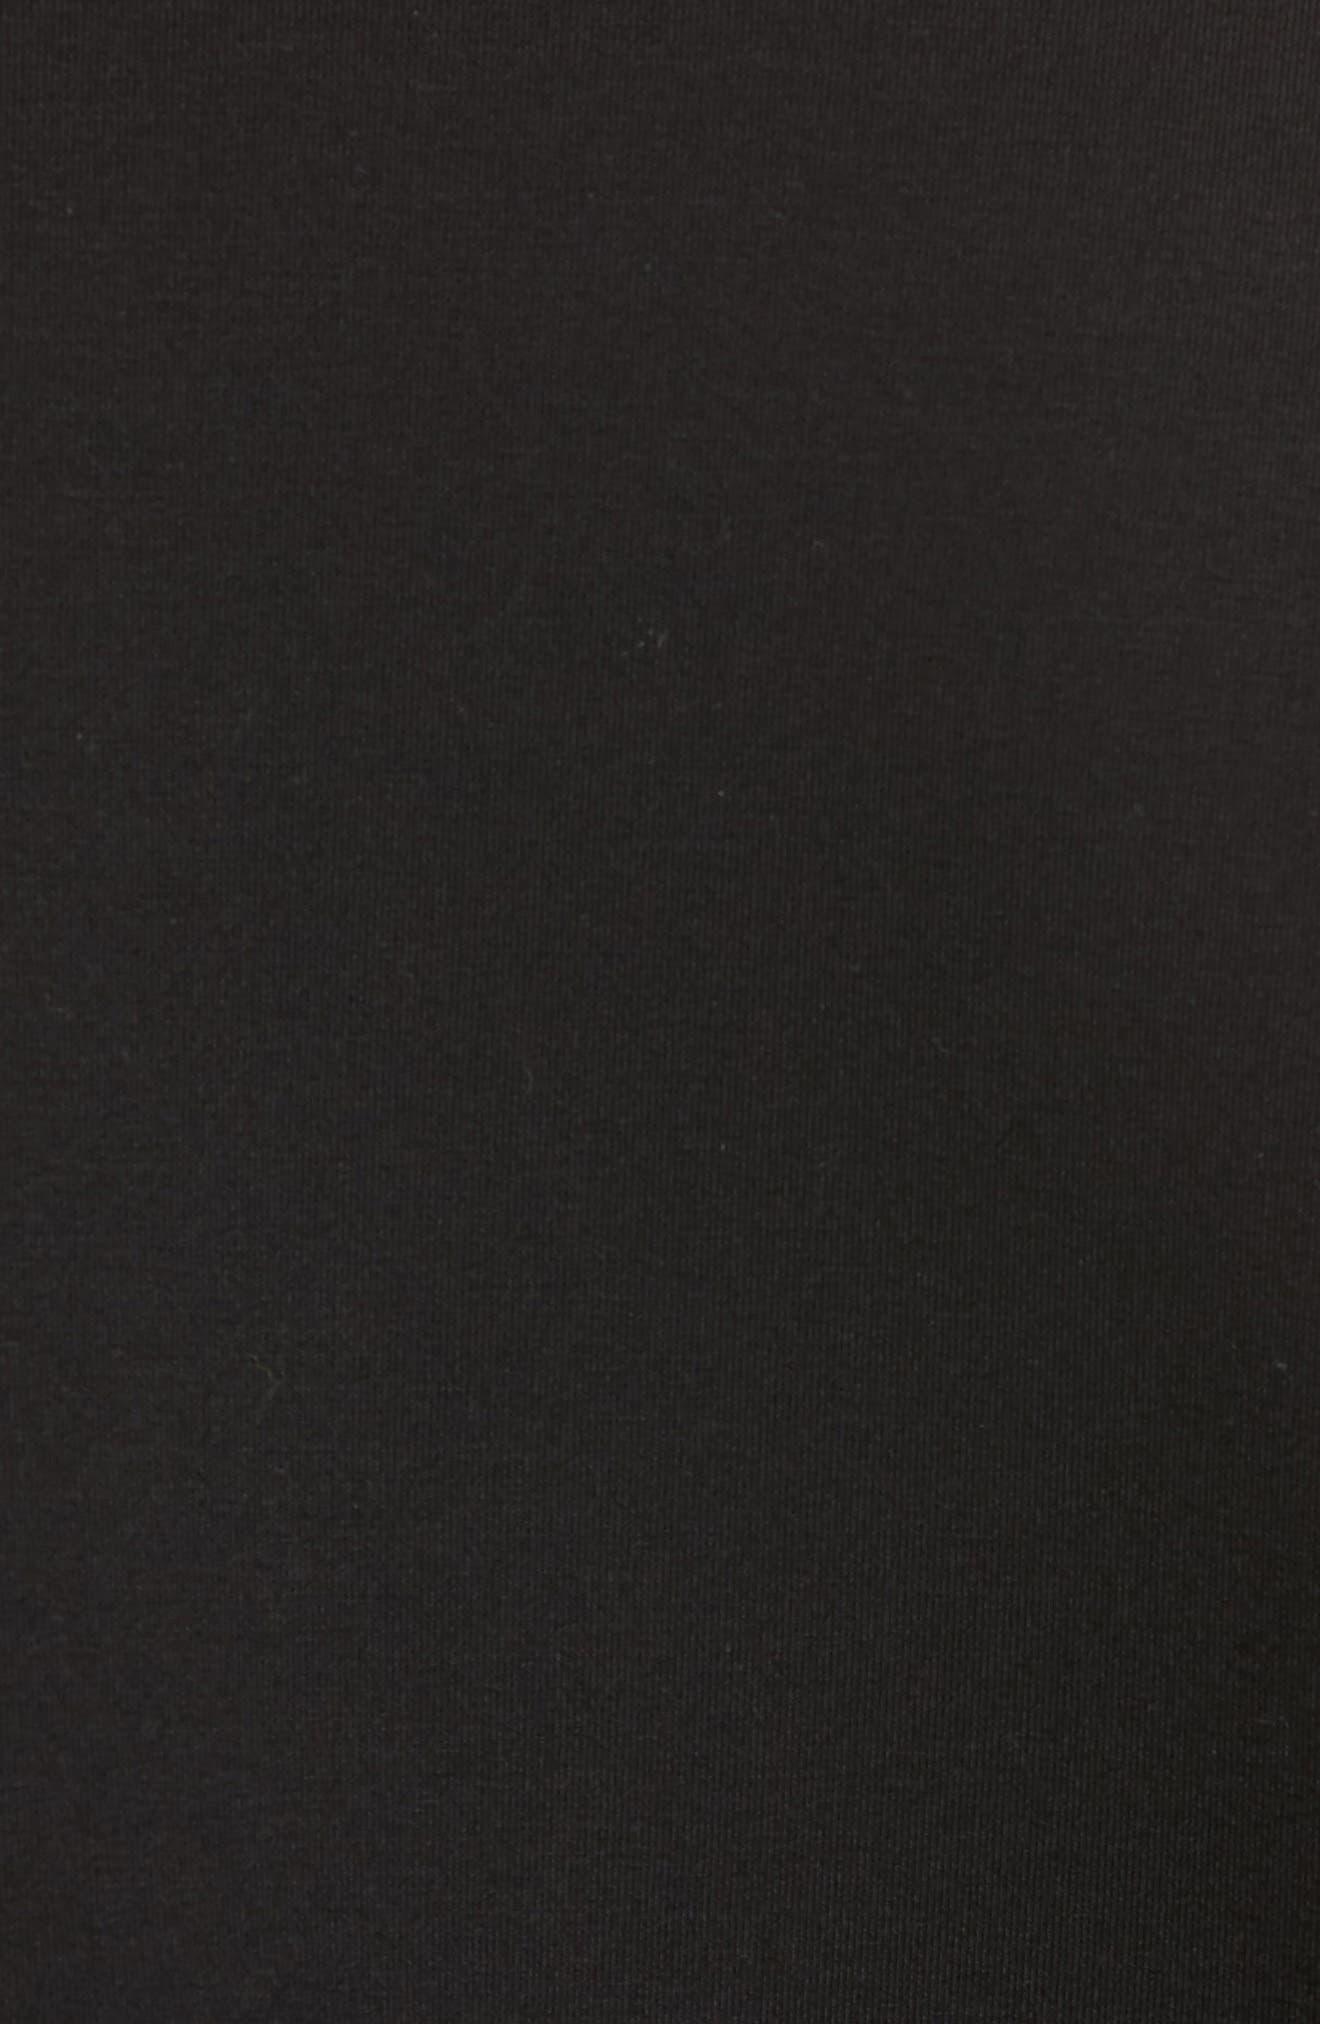 Slim Fit Tech Jacket,                             Alternate thumbnail 5, color,                             Black